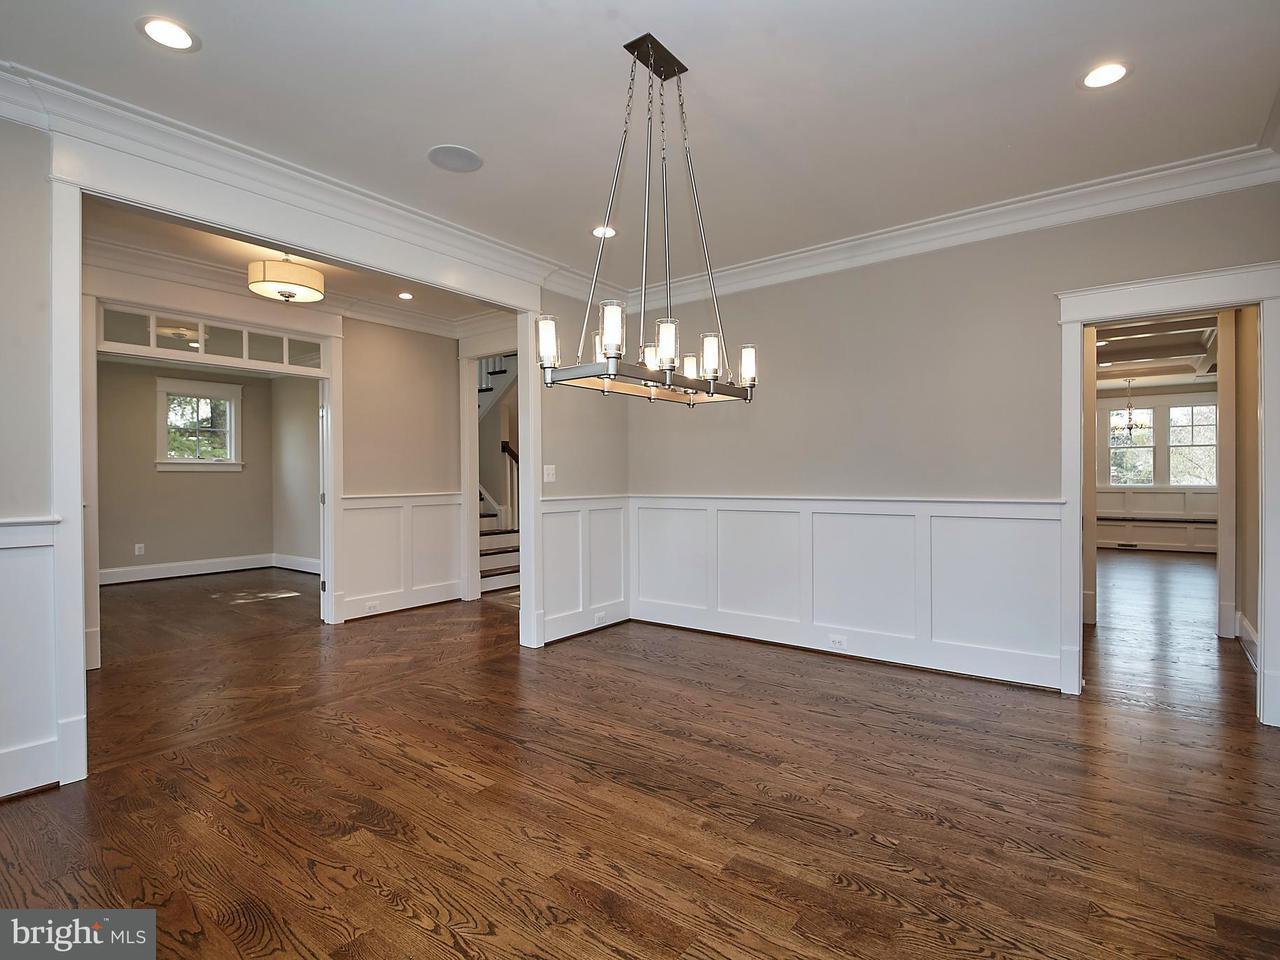 Single Family Home for Sale at 3200 Trinidad Street 3200 Trinidad Street Arlington, Virginia 22213 United States